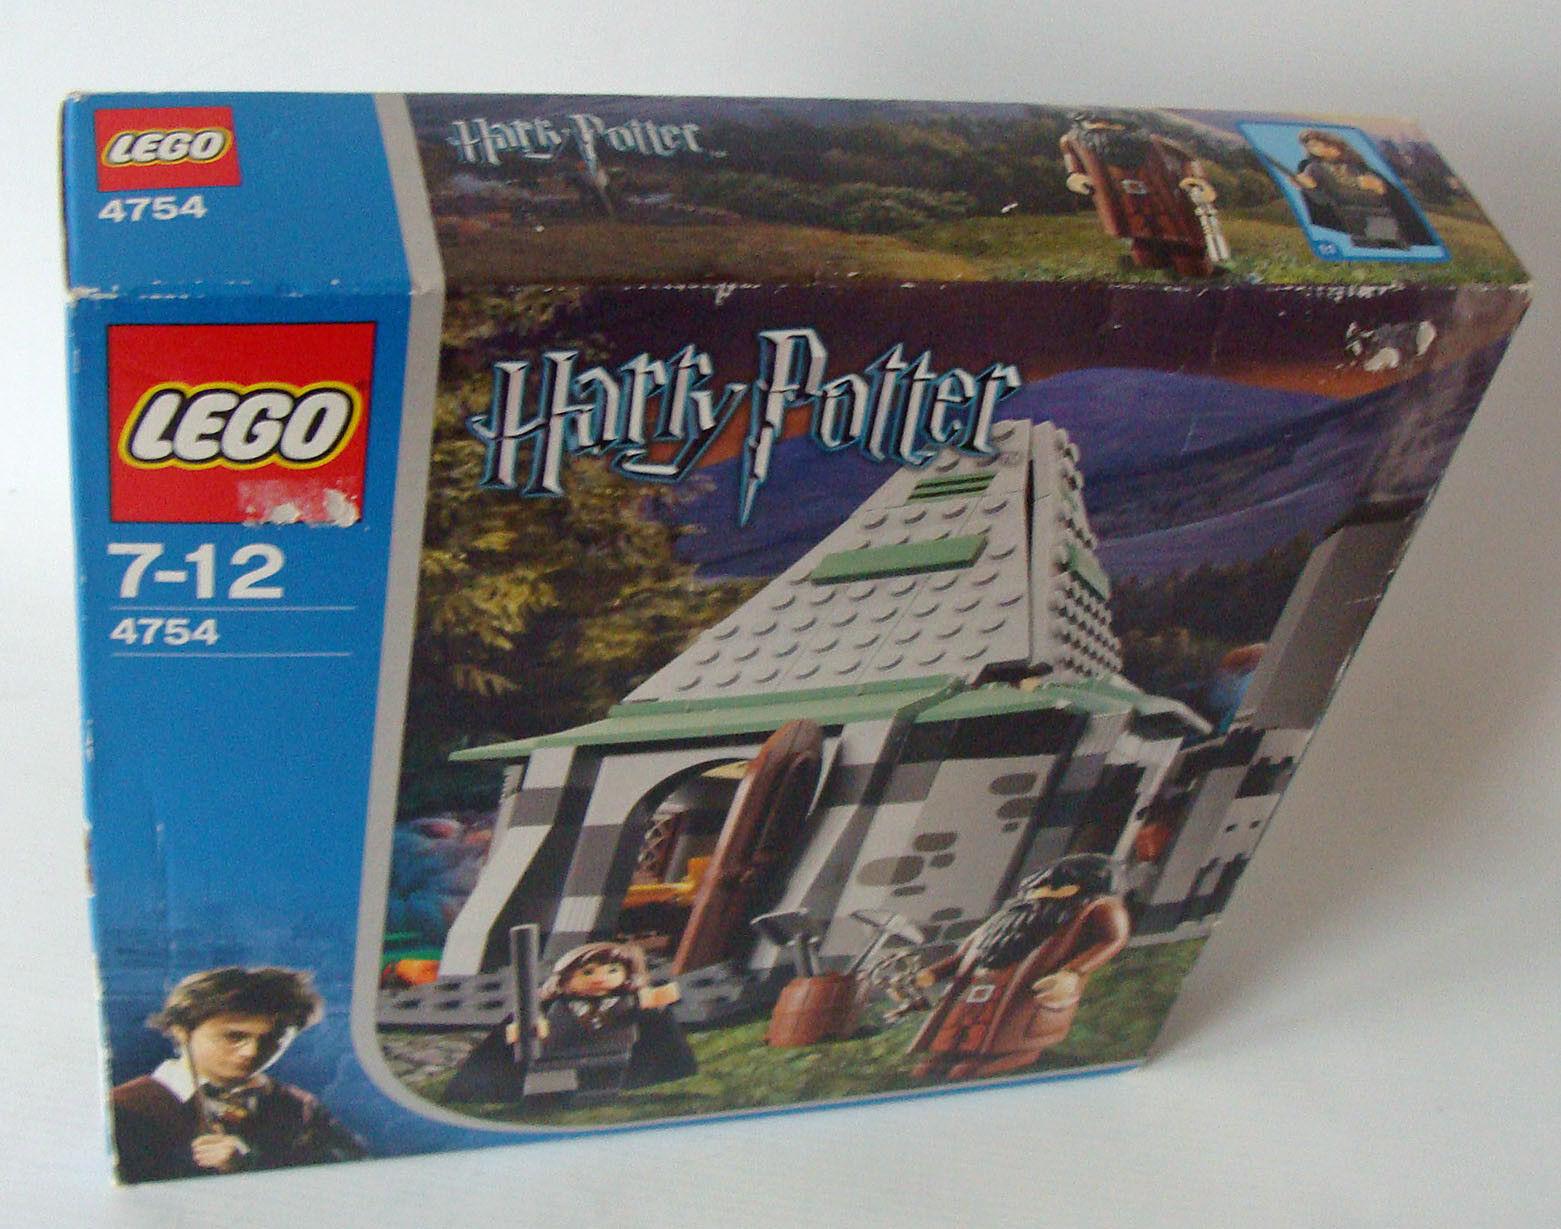 Lego® Harry Potter 4754 - Hagrids Hütte 302 Teile 7-12 Jahren Neu New